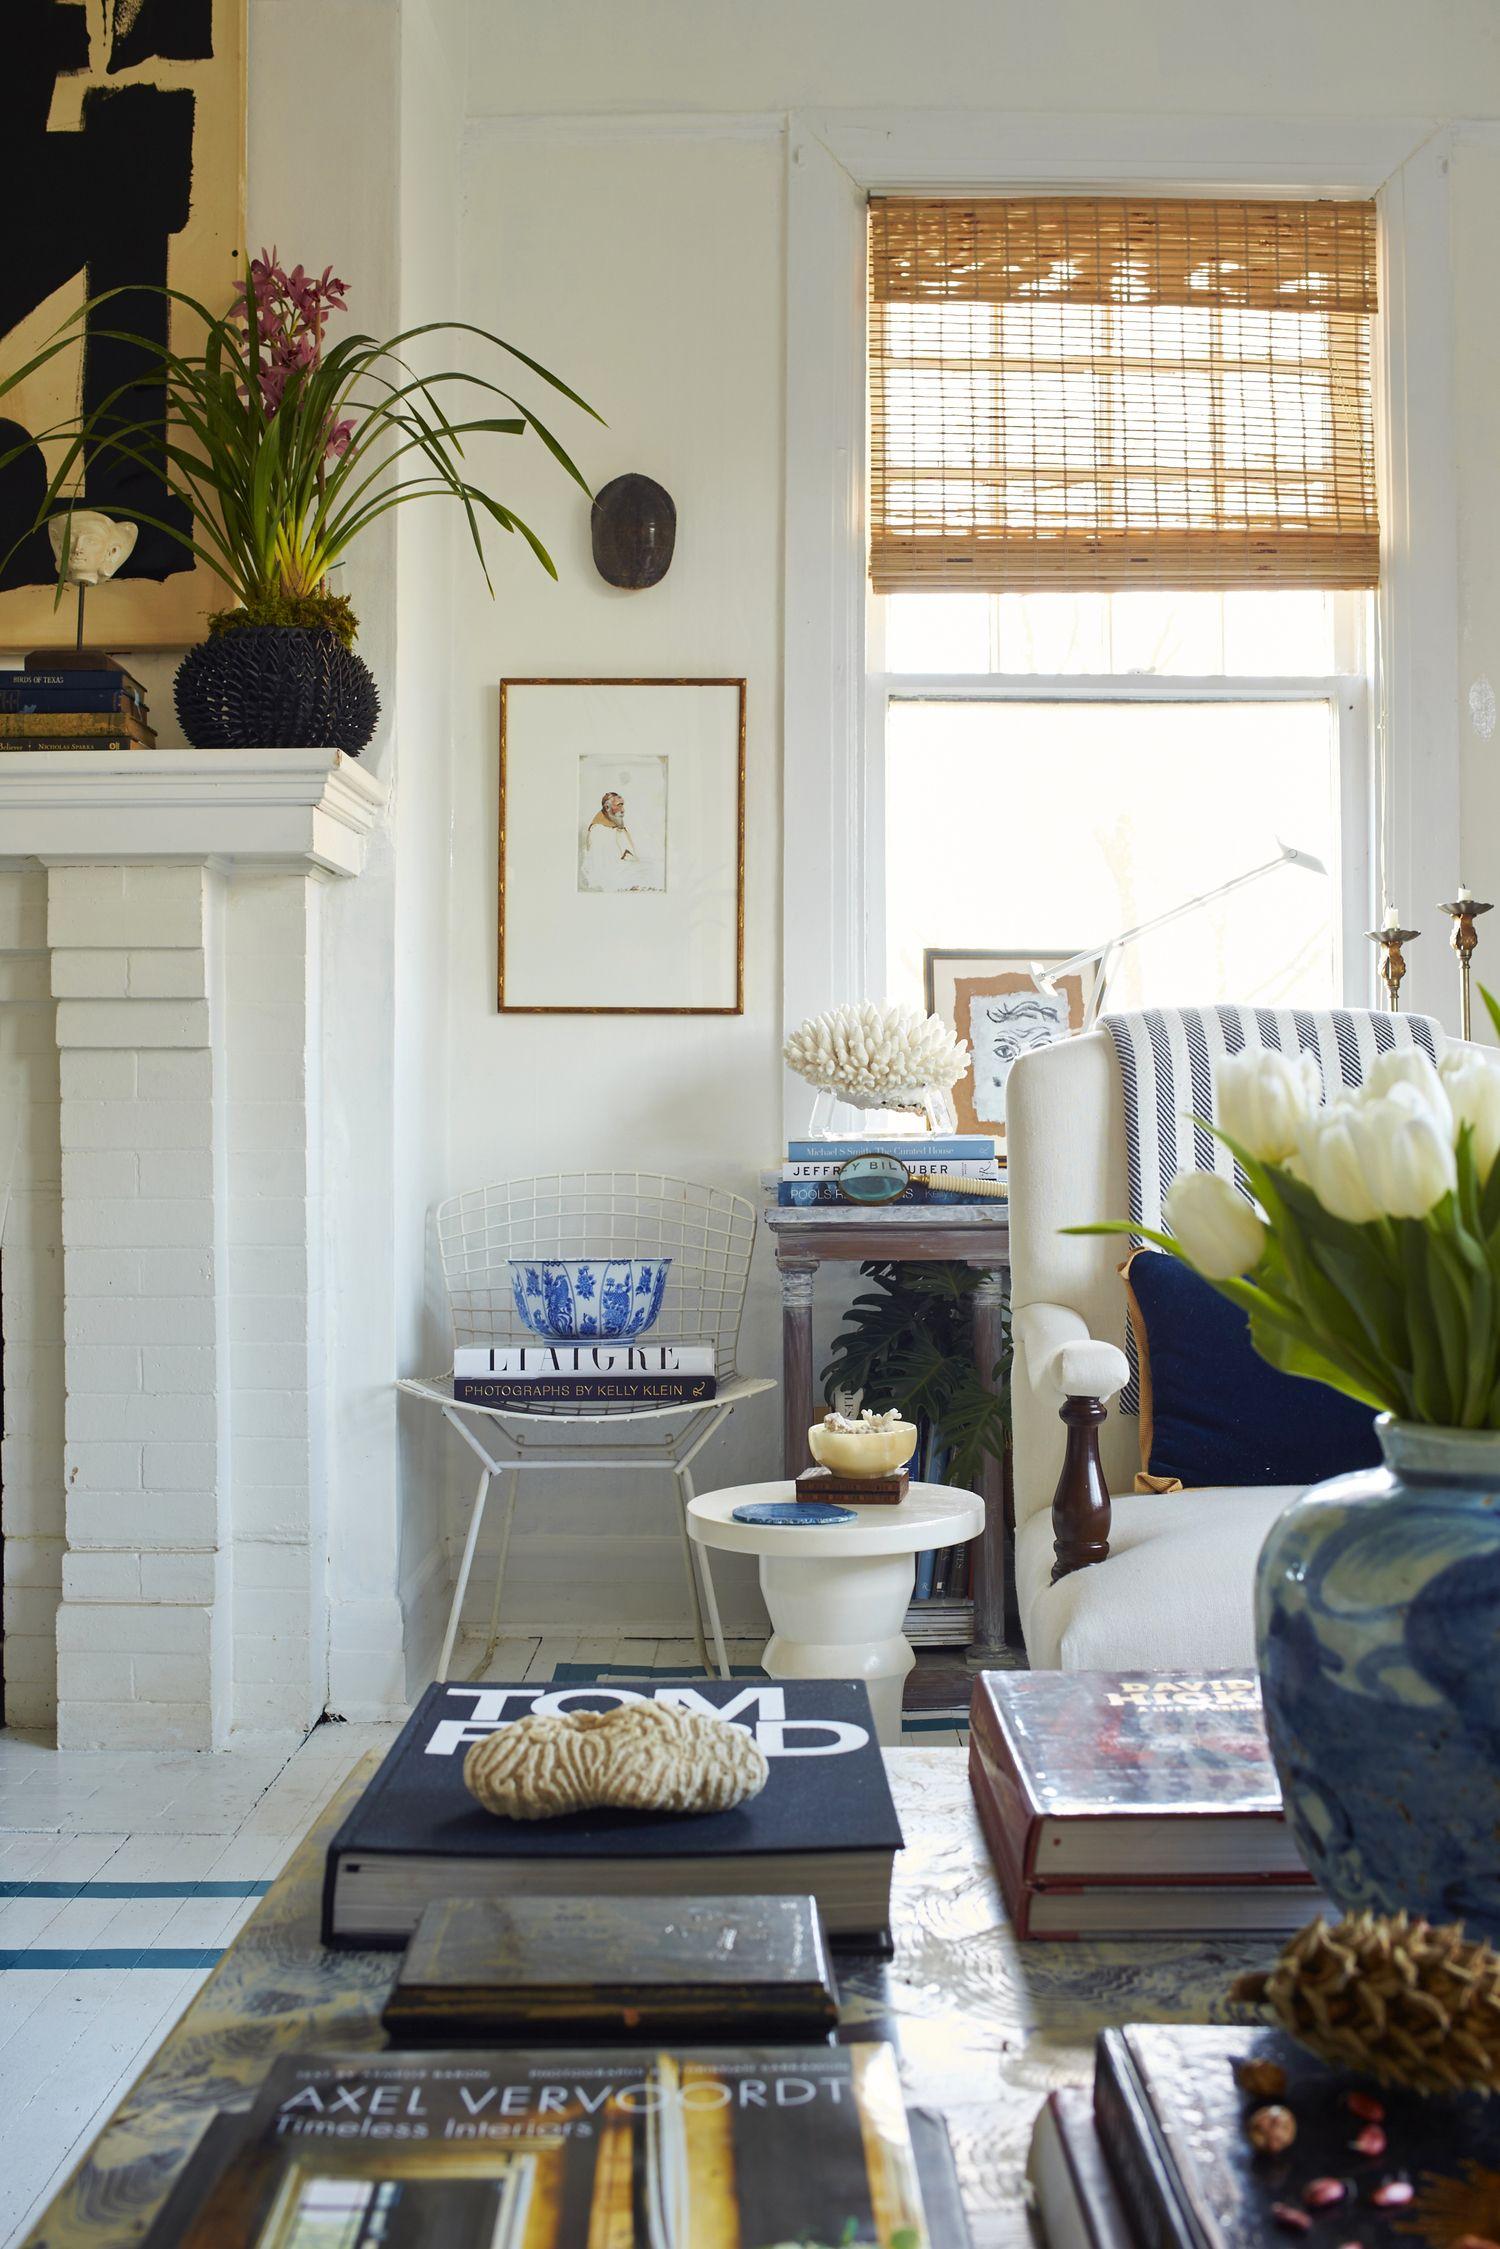 868 336 Exterior Home Design Ideas Remodel Pictures: Home Interior Design, Home Decor, Warm Paint Colors